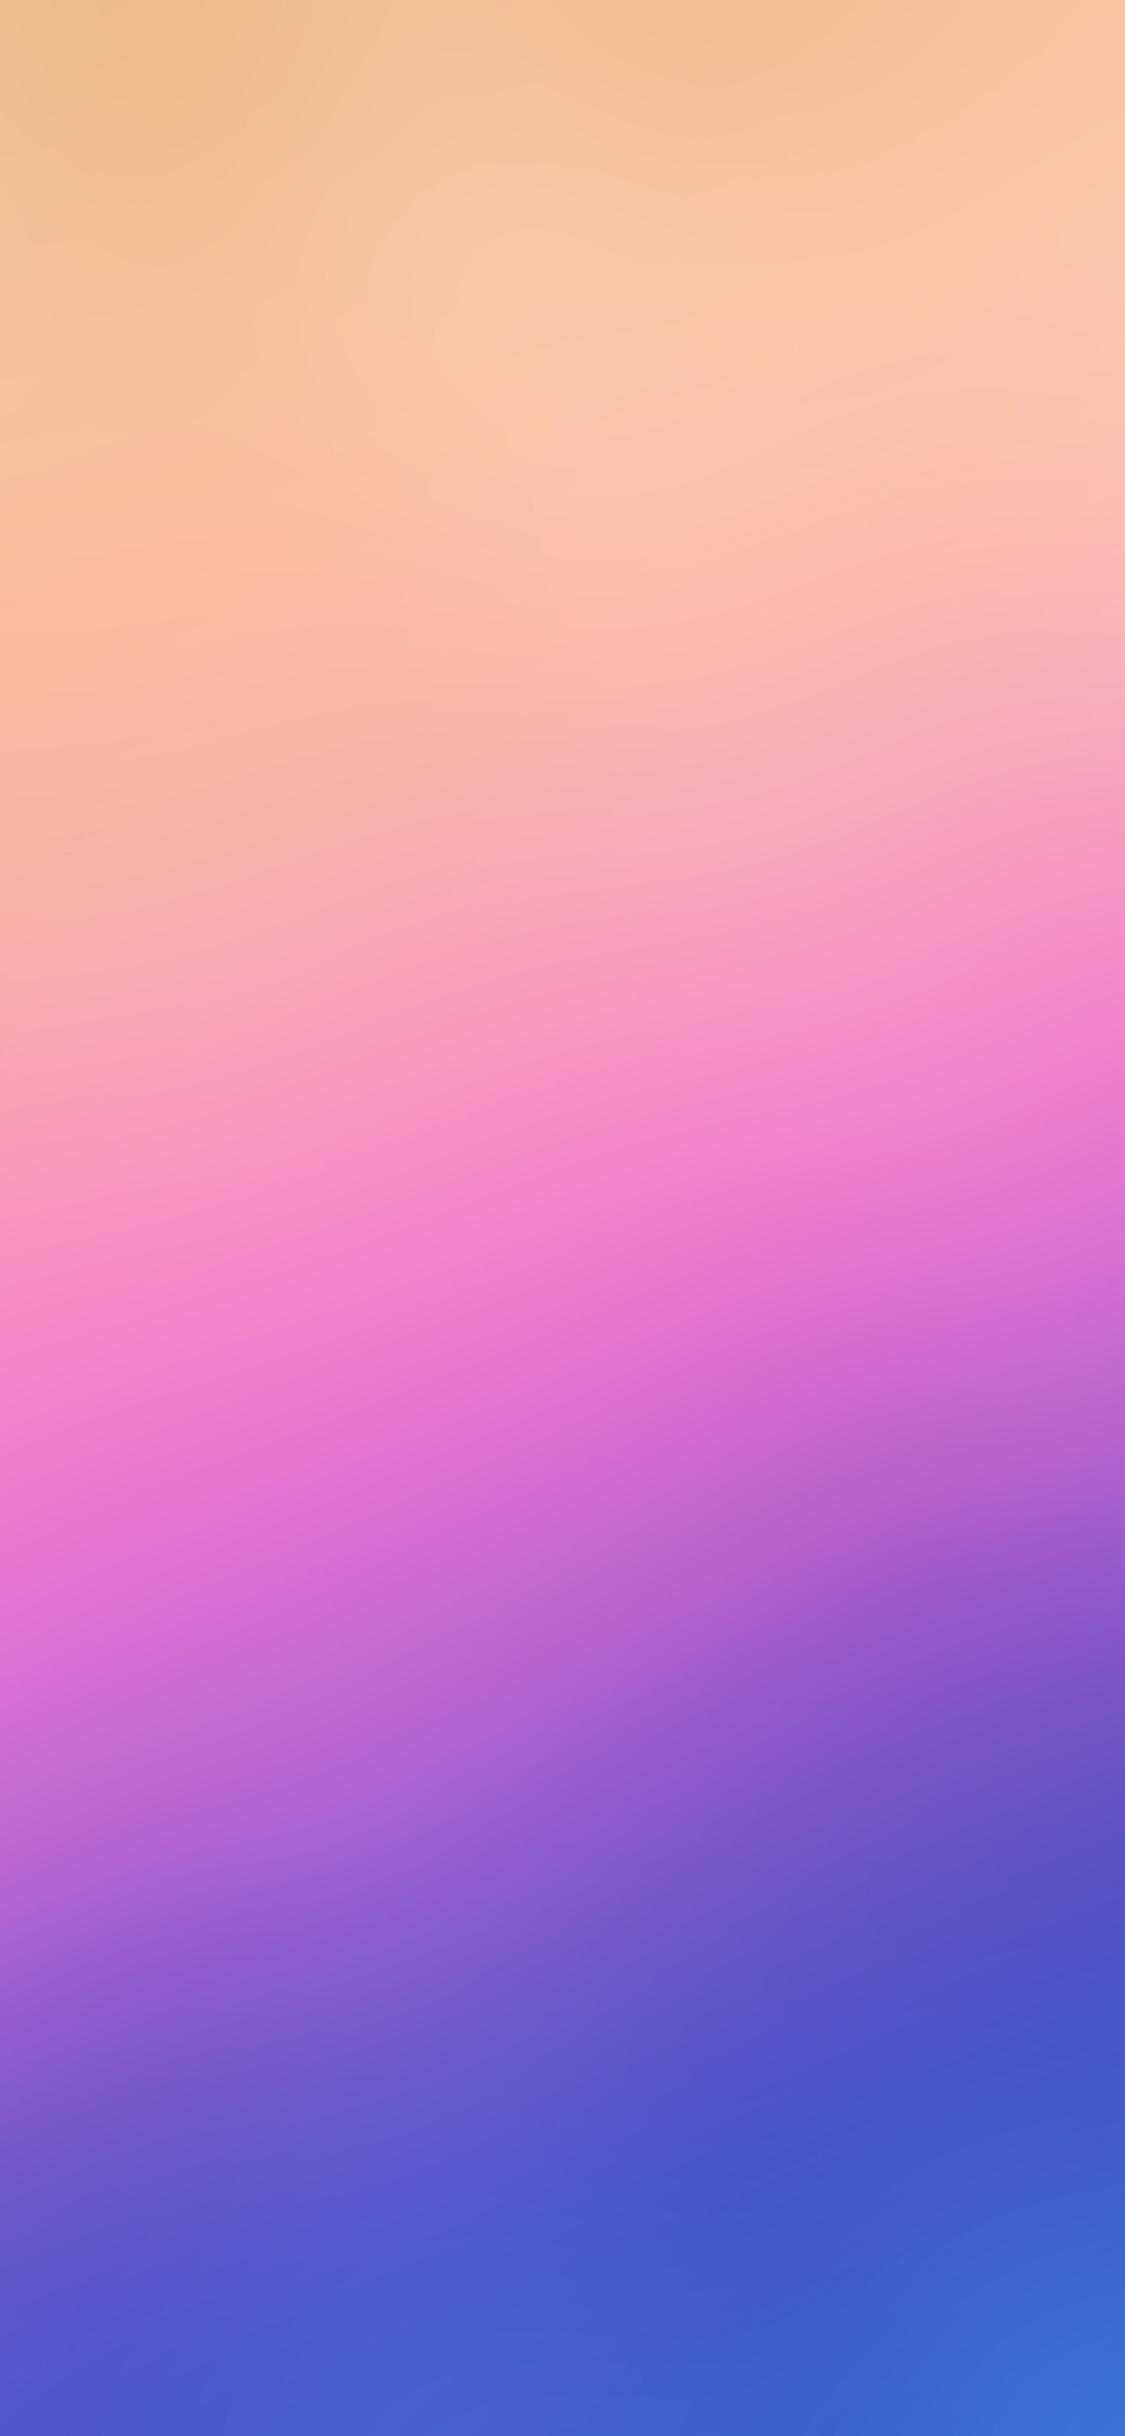 iPhoneXpapers.com-Apple-iPhone-wallpaper-sa37-calm-morning-blur